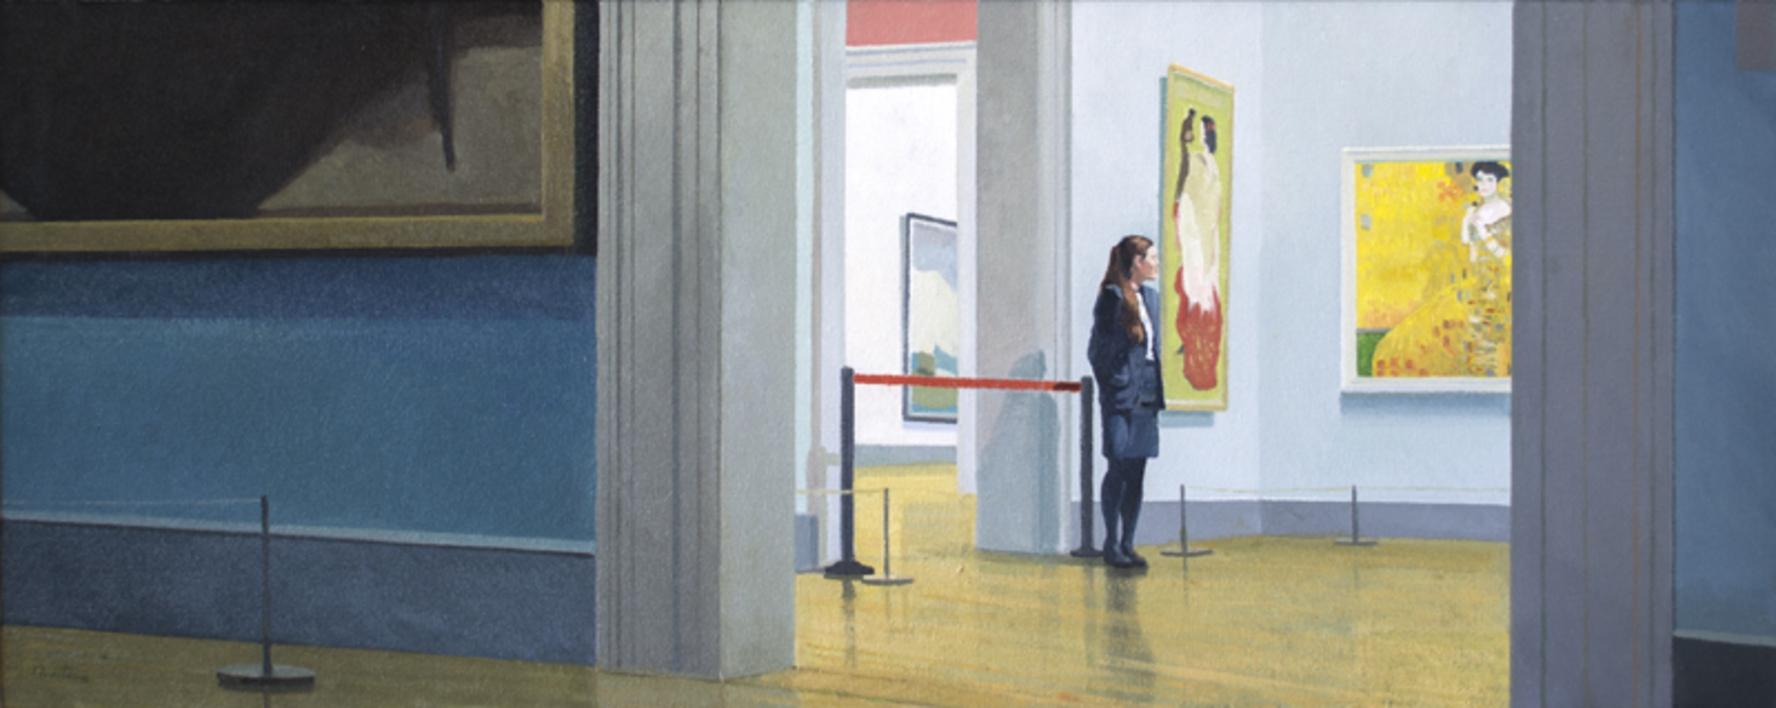 Ad-miradas |Pintura de Orrite | Compra arte en Flecha.es